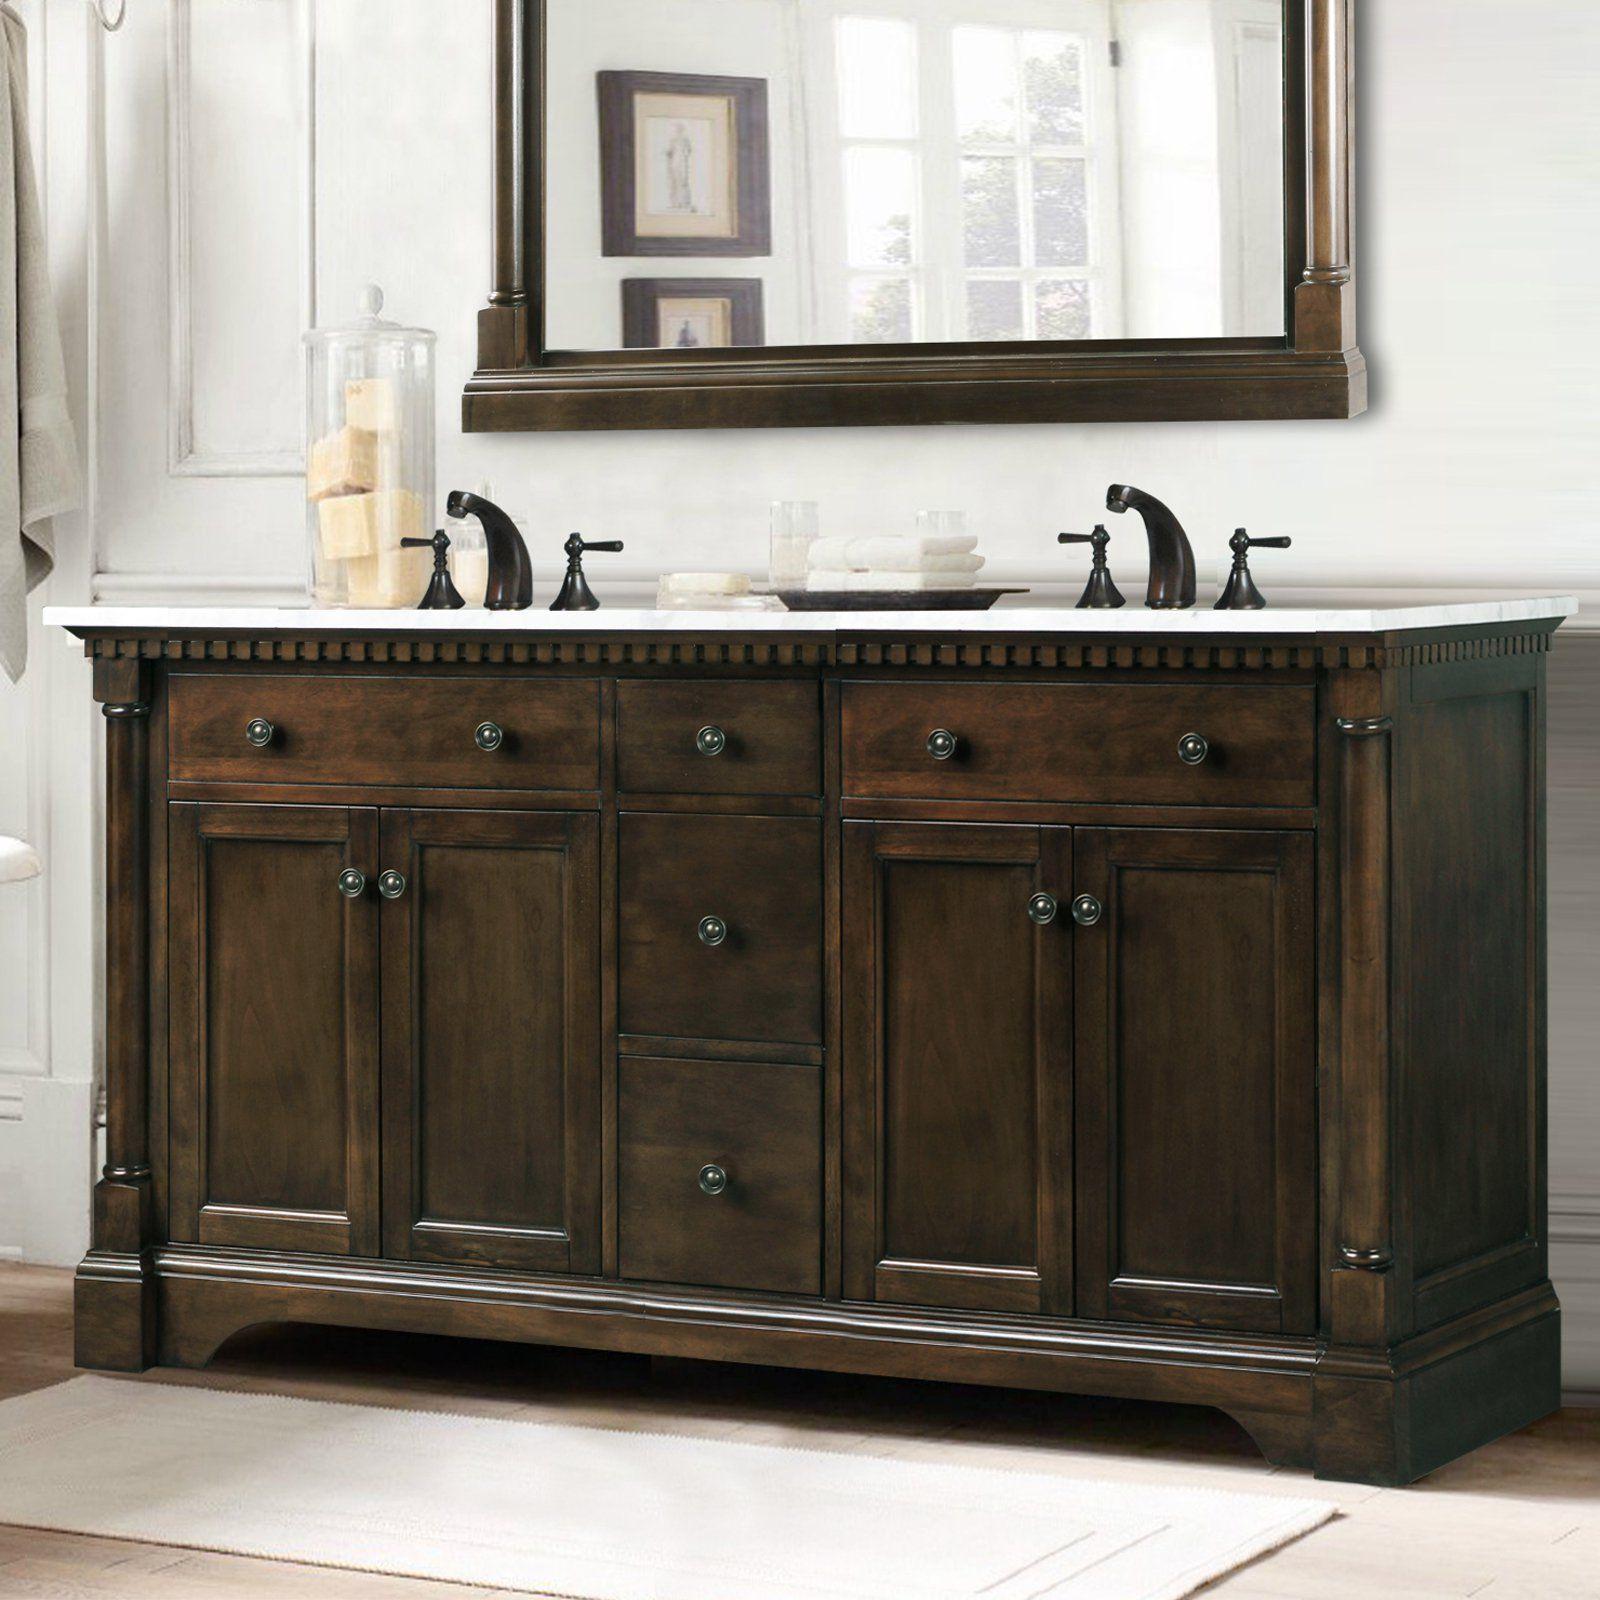 Legion Furniture Wlf6036 60 60 In Double Bathroom Vanity With